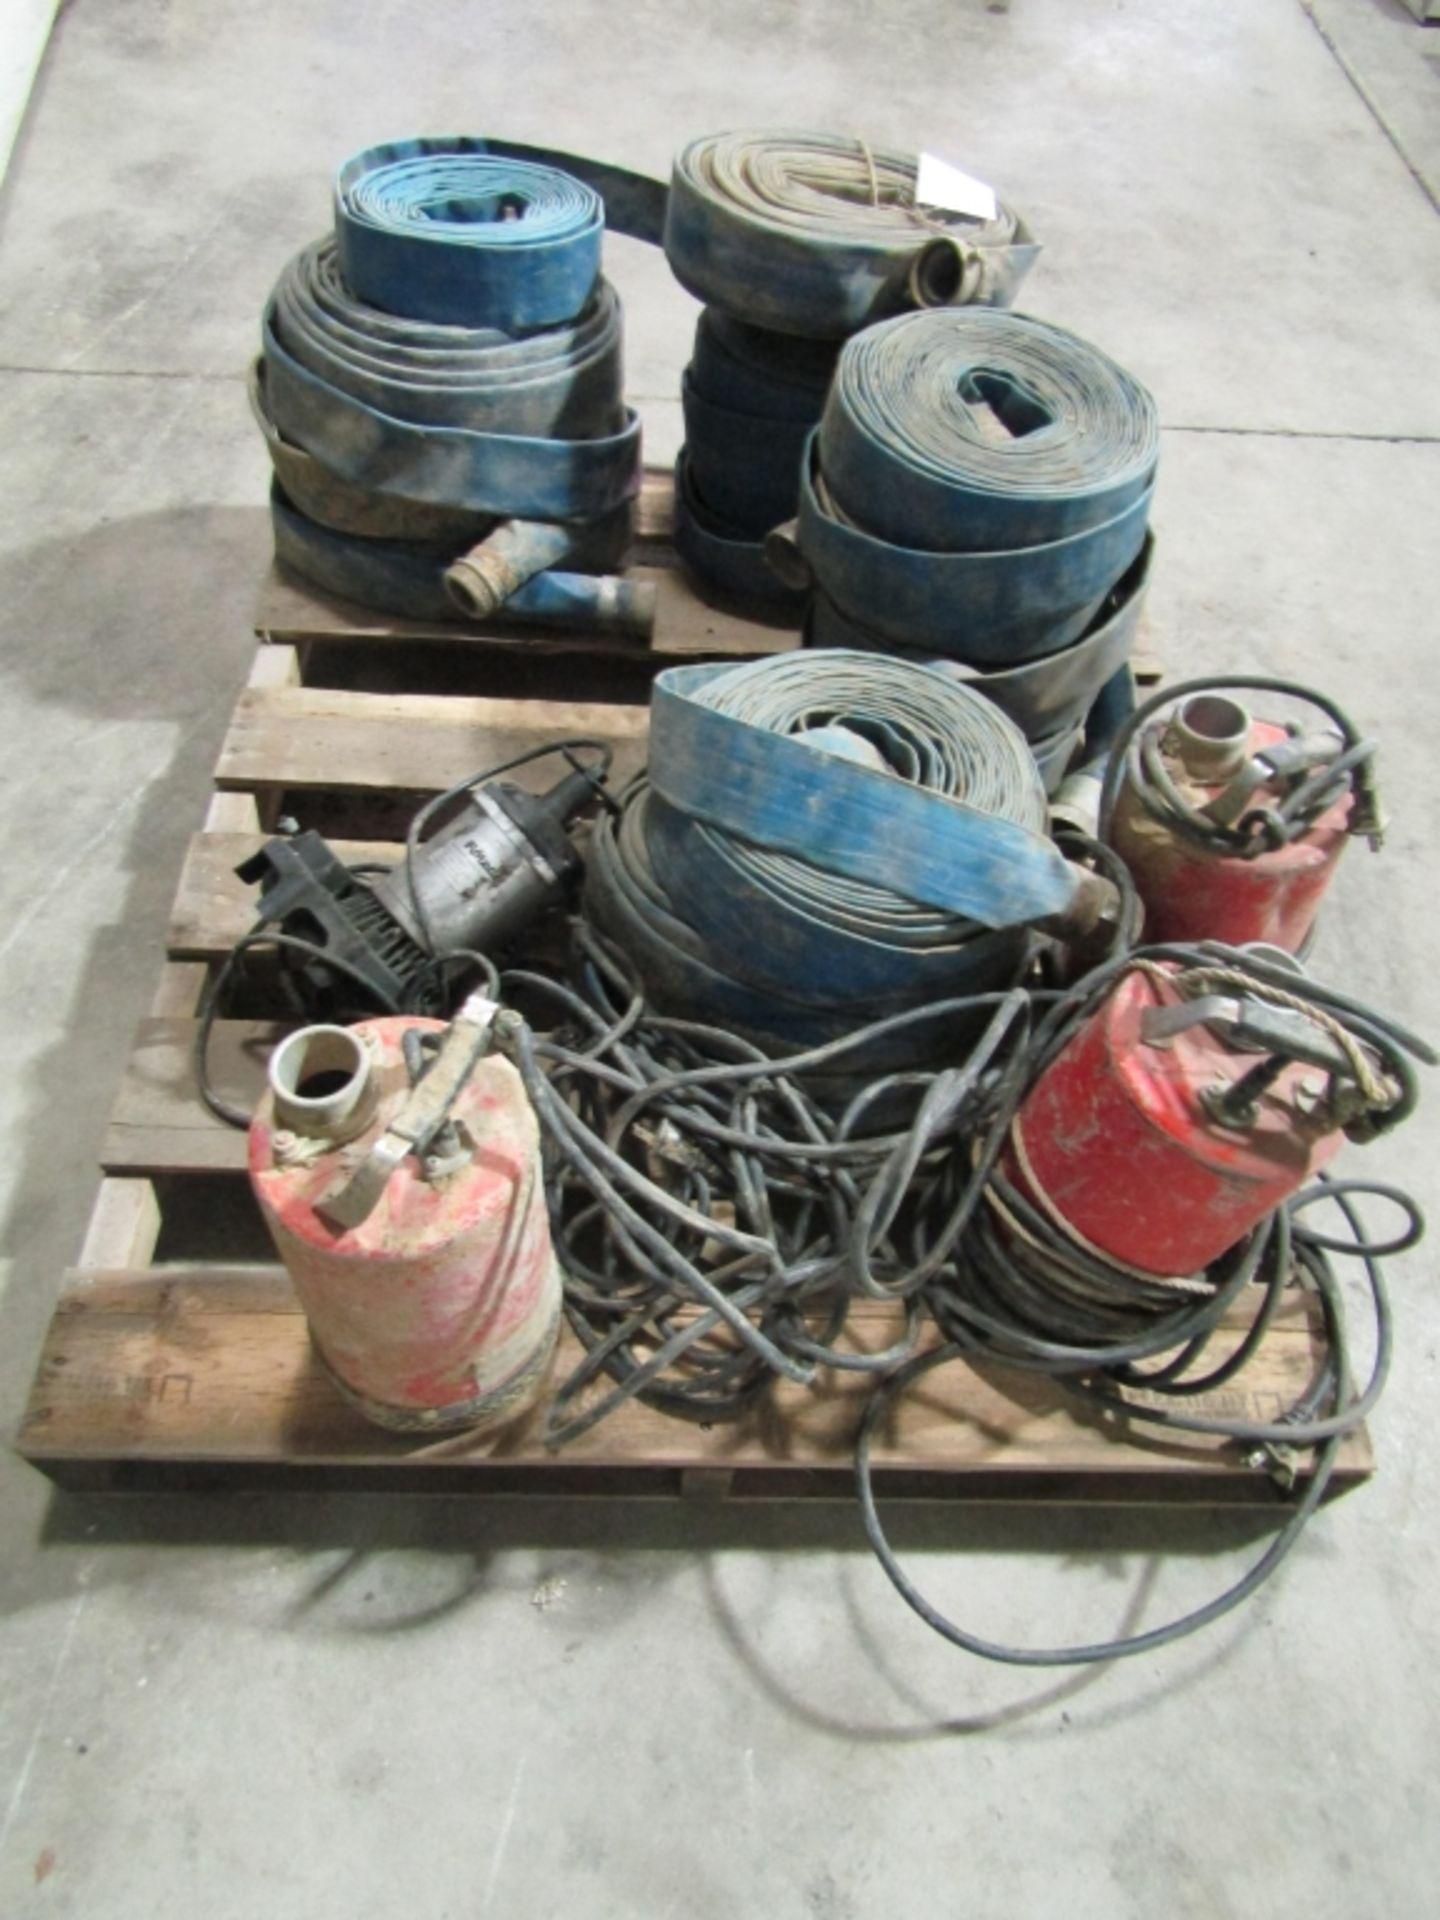 Lot 260 - Pallet of Trash Pump Hose & Sprayers, Located in Winterset, IA